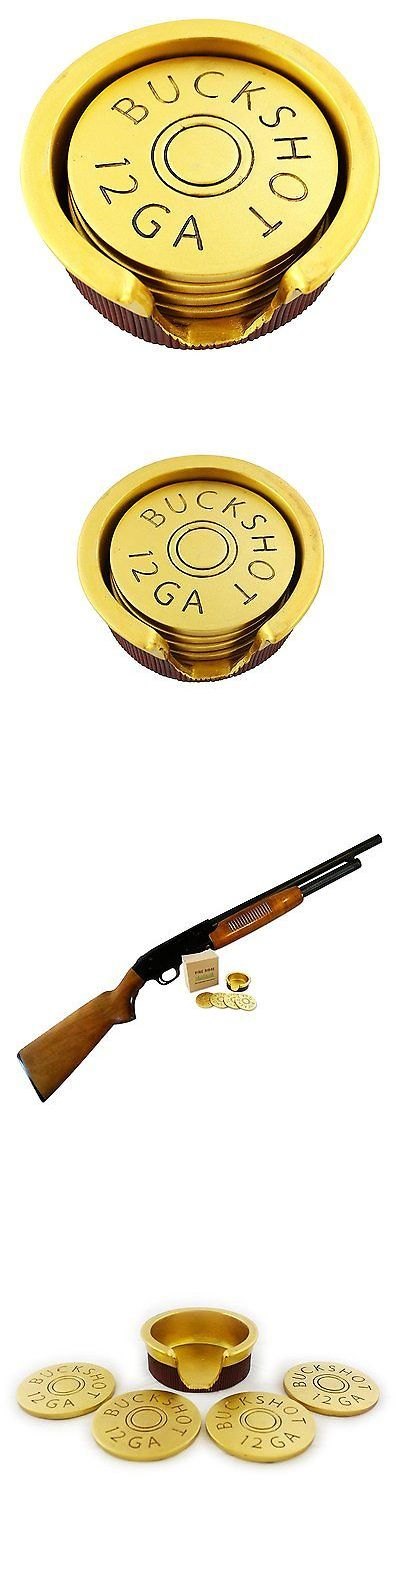 Coasters 36026: 12 Gauge Shotgun Shell Coaster Set Holder Drink Man Cave Decor Gun Gifts Men -> BUY IT NOW ONLY: $32.7 on eBay!